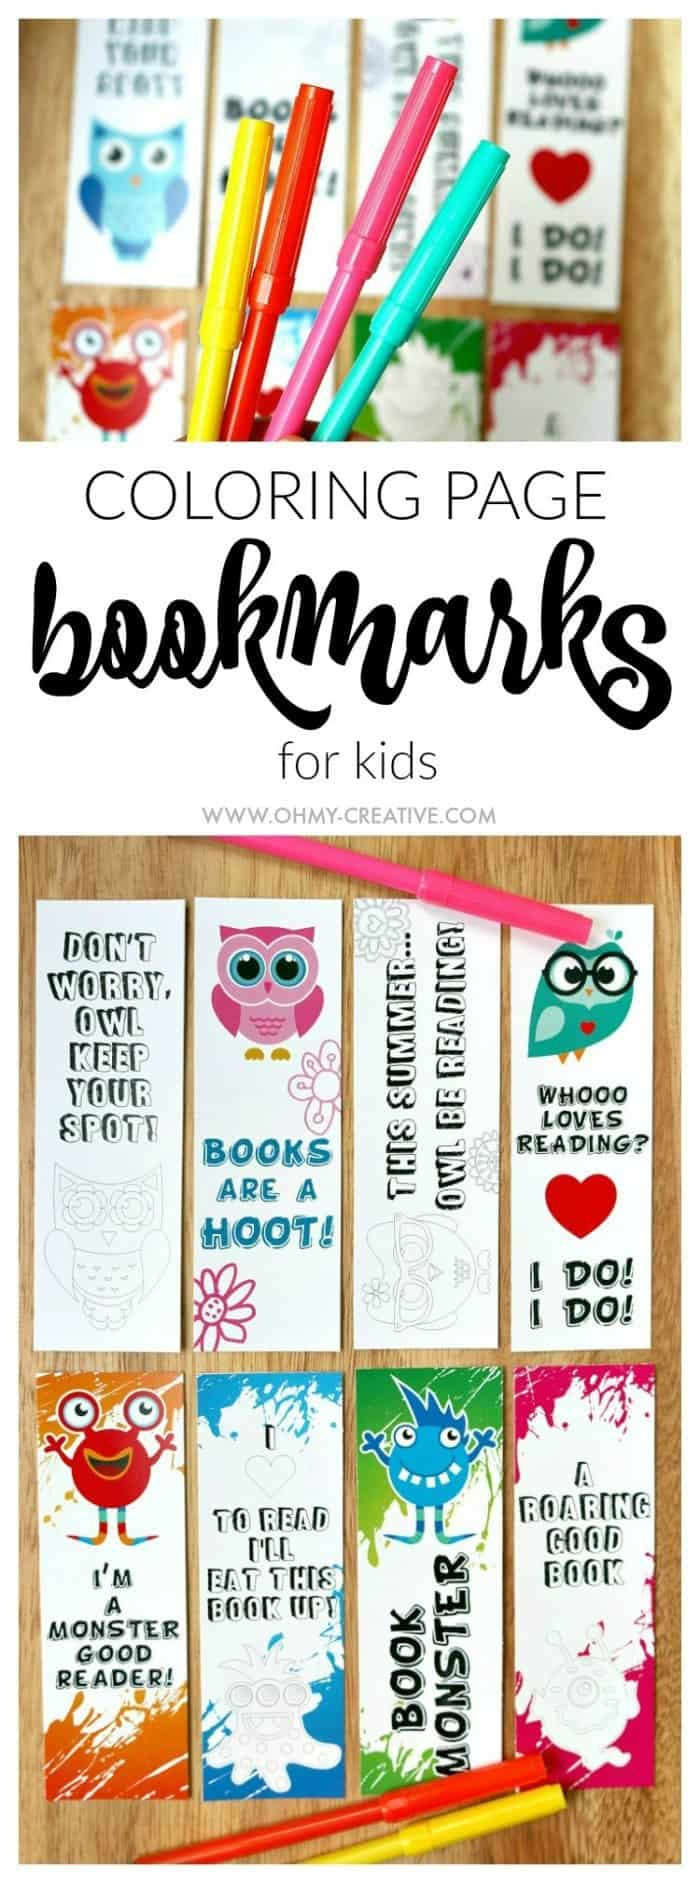 Bookmark-Collage-2